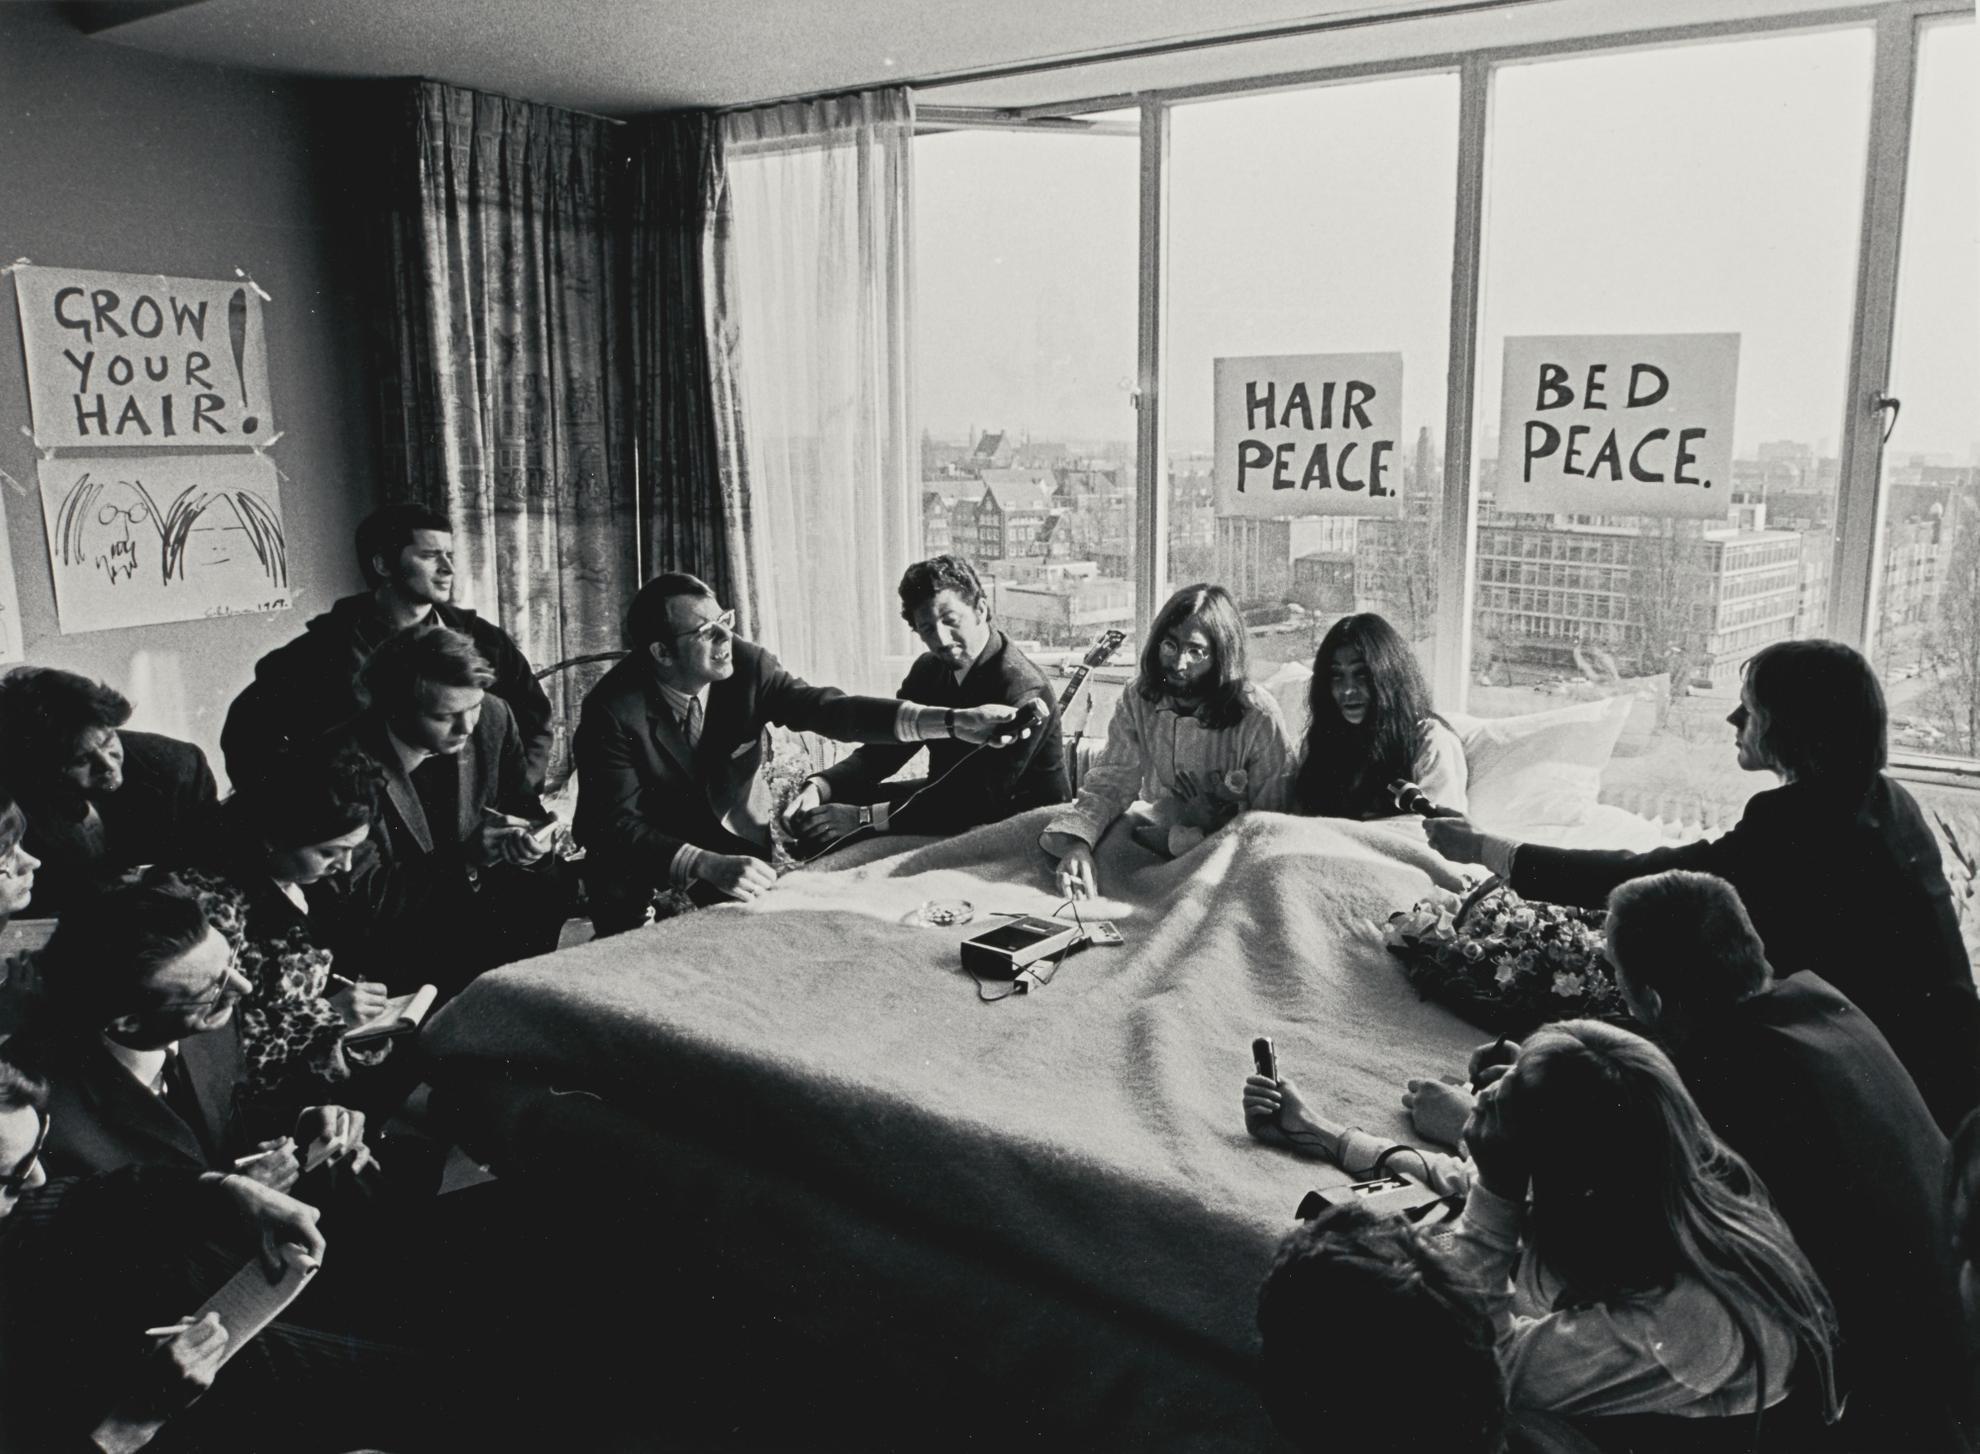 Cor Jaring - John And Yoko, Hilton Hotel, Amsterdam-1969